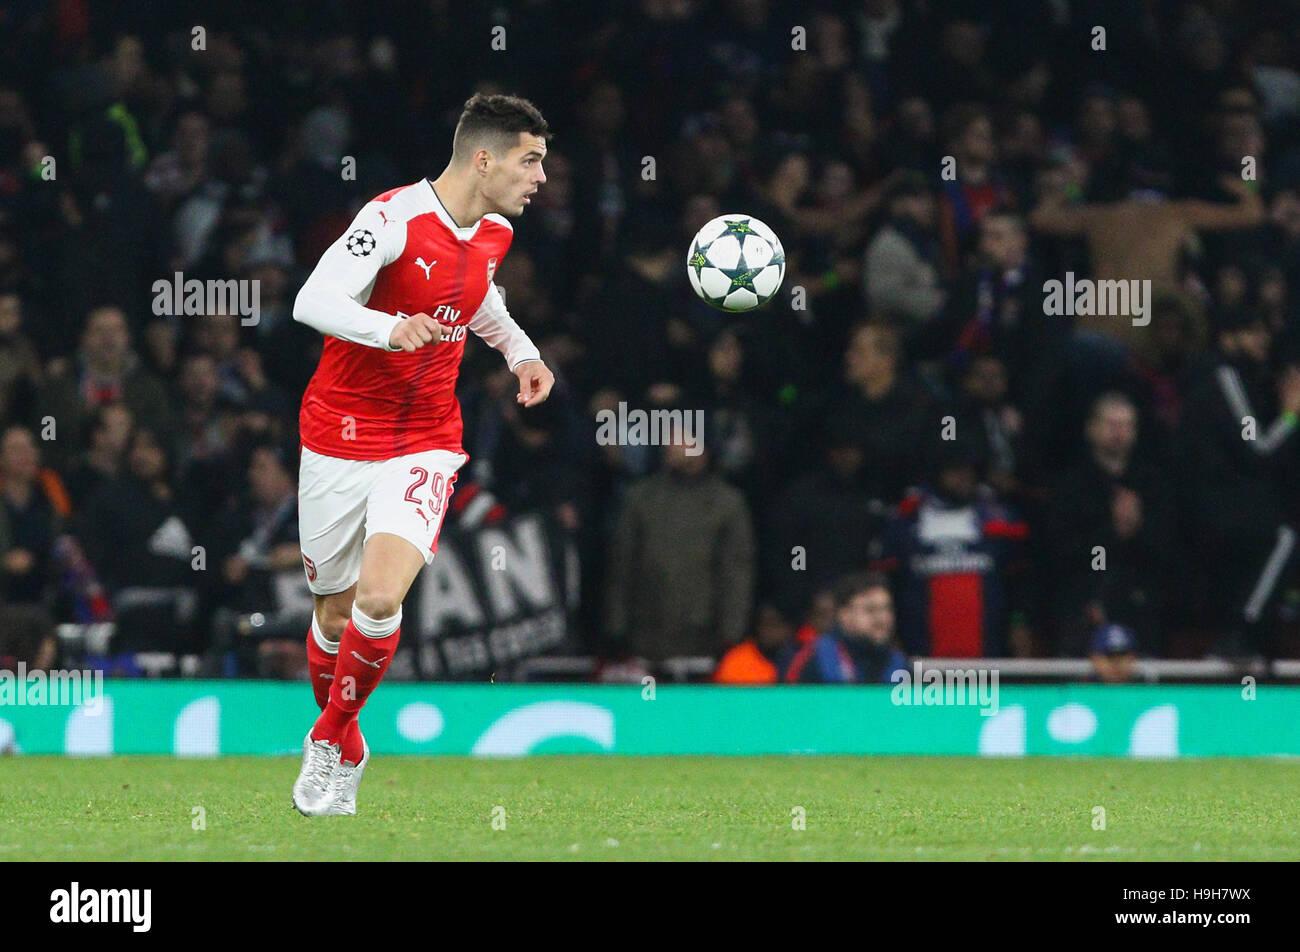 Emirates Stadium London UK 23rd Nov 2016 Granit Xhaka of